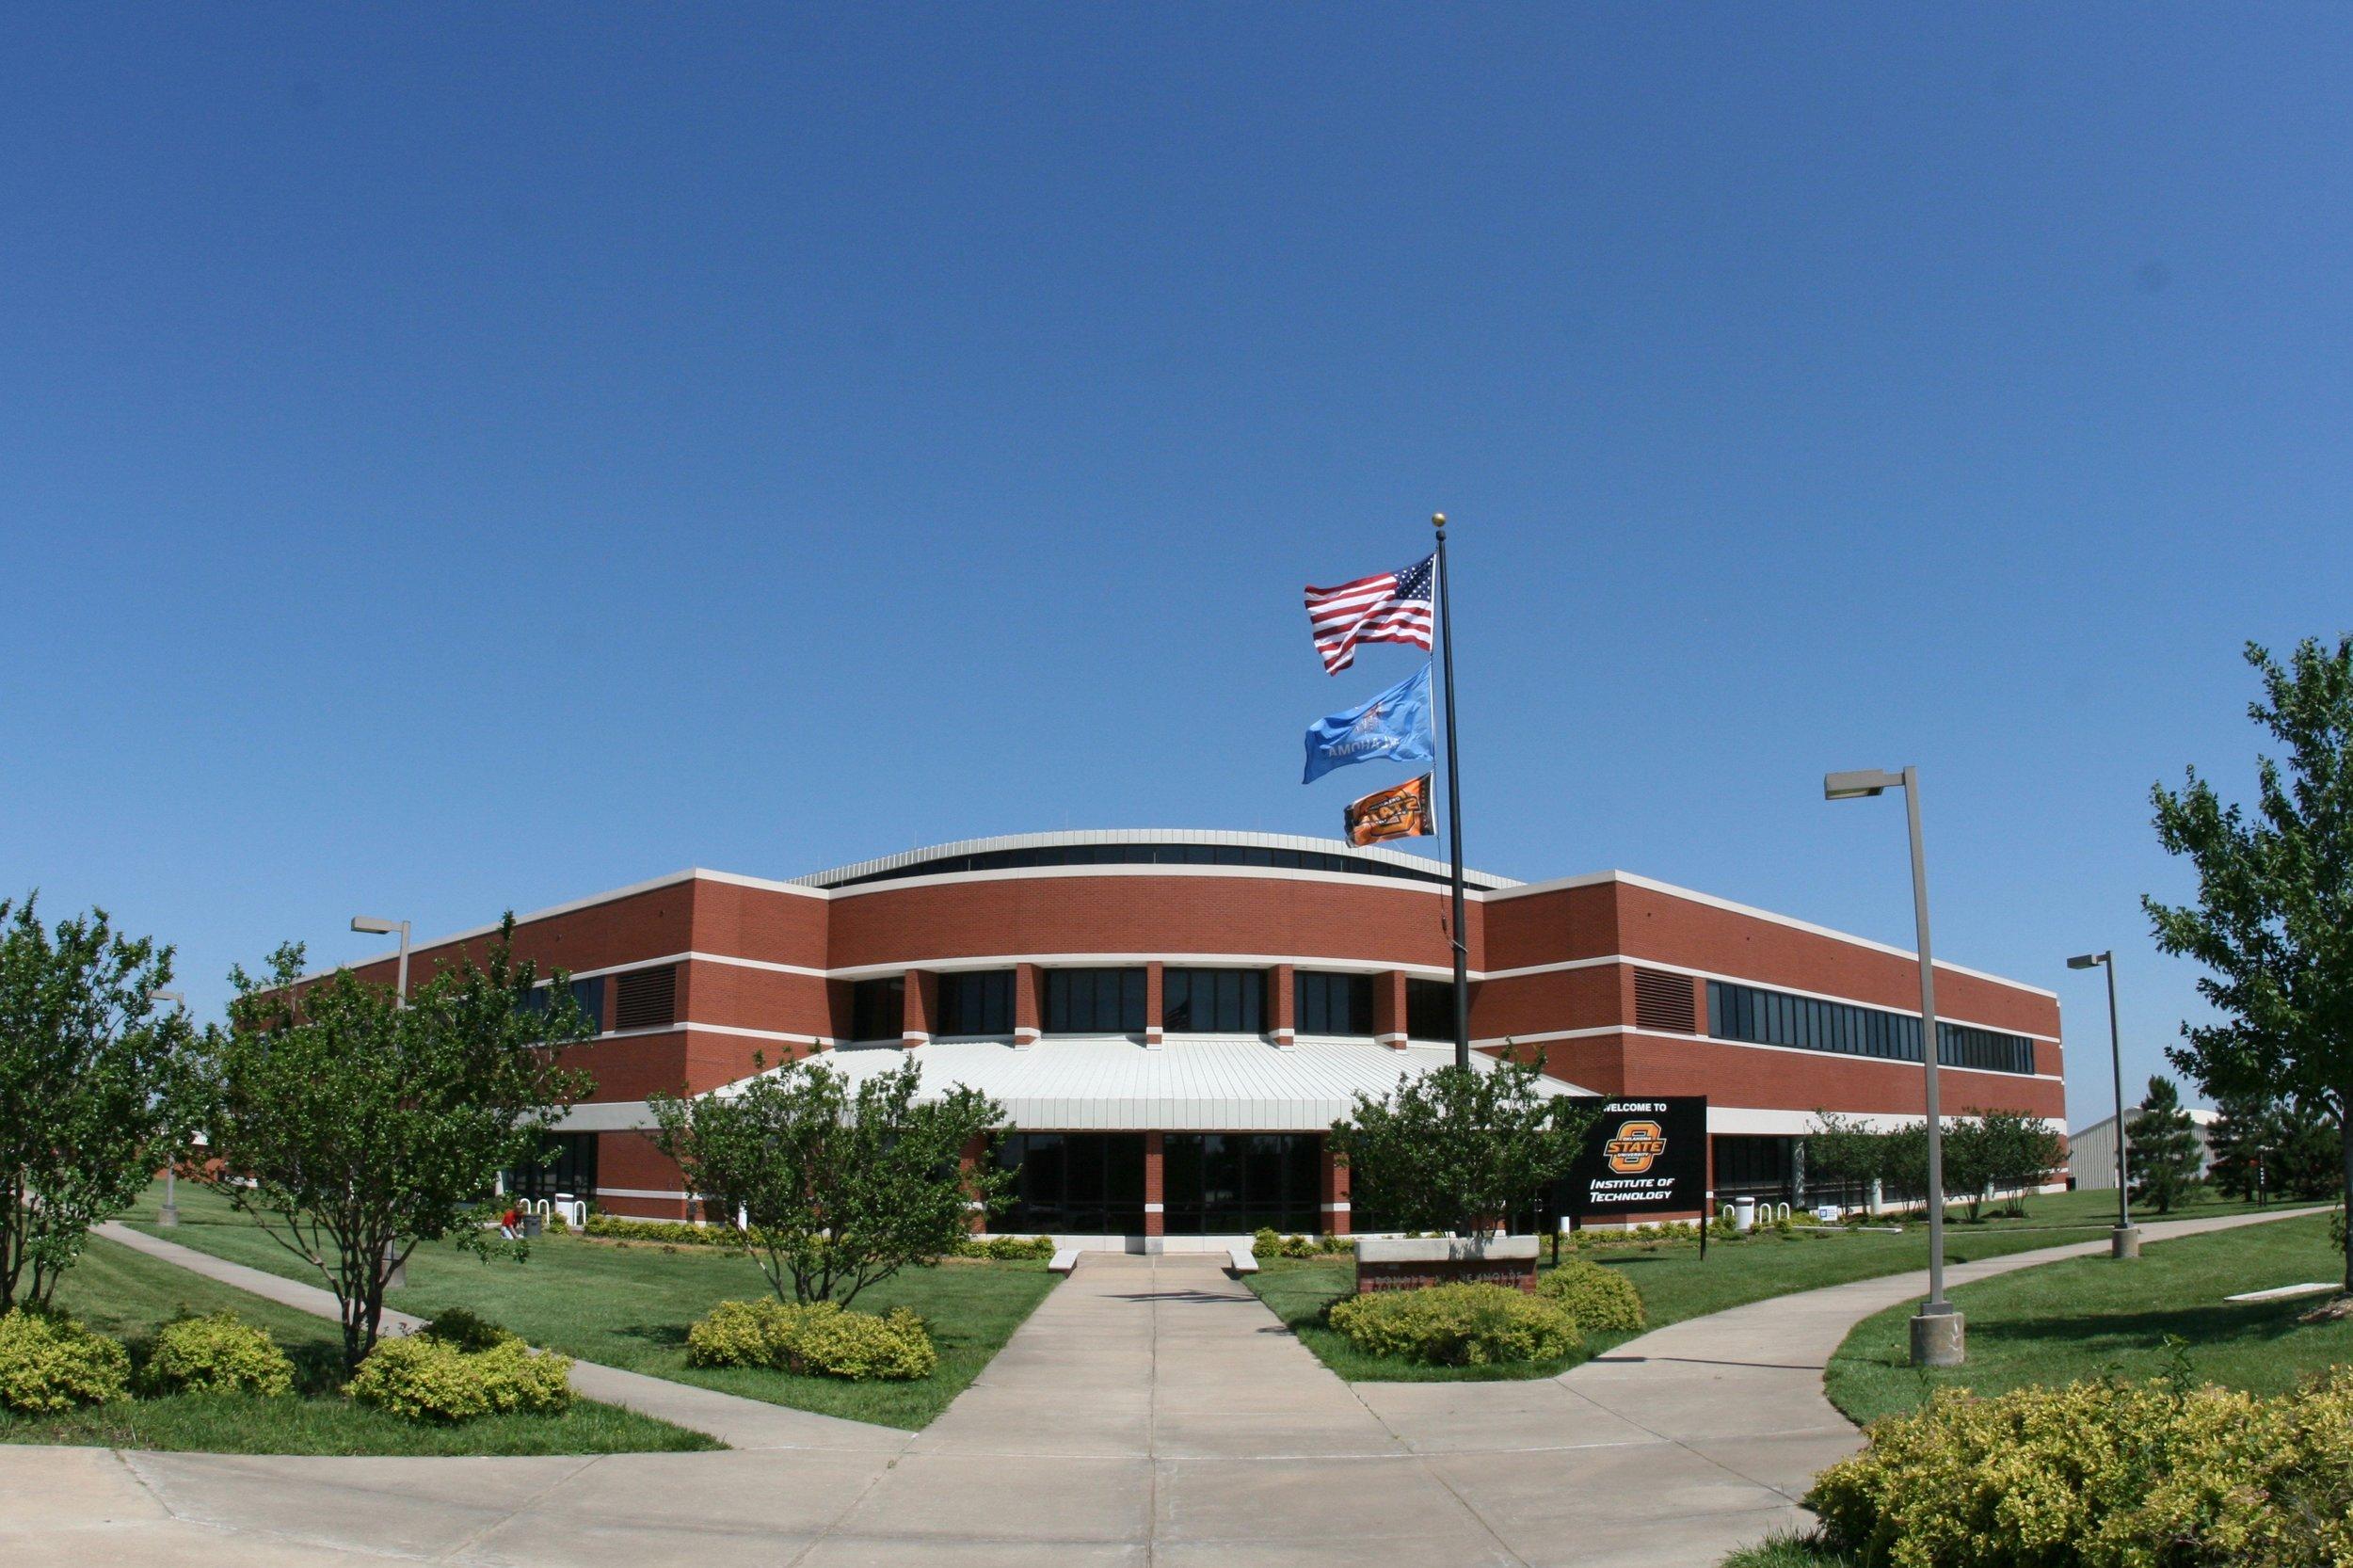 The OSUIT Donald W. Reynolds Technology Center